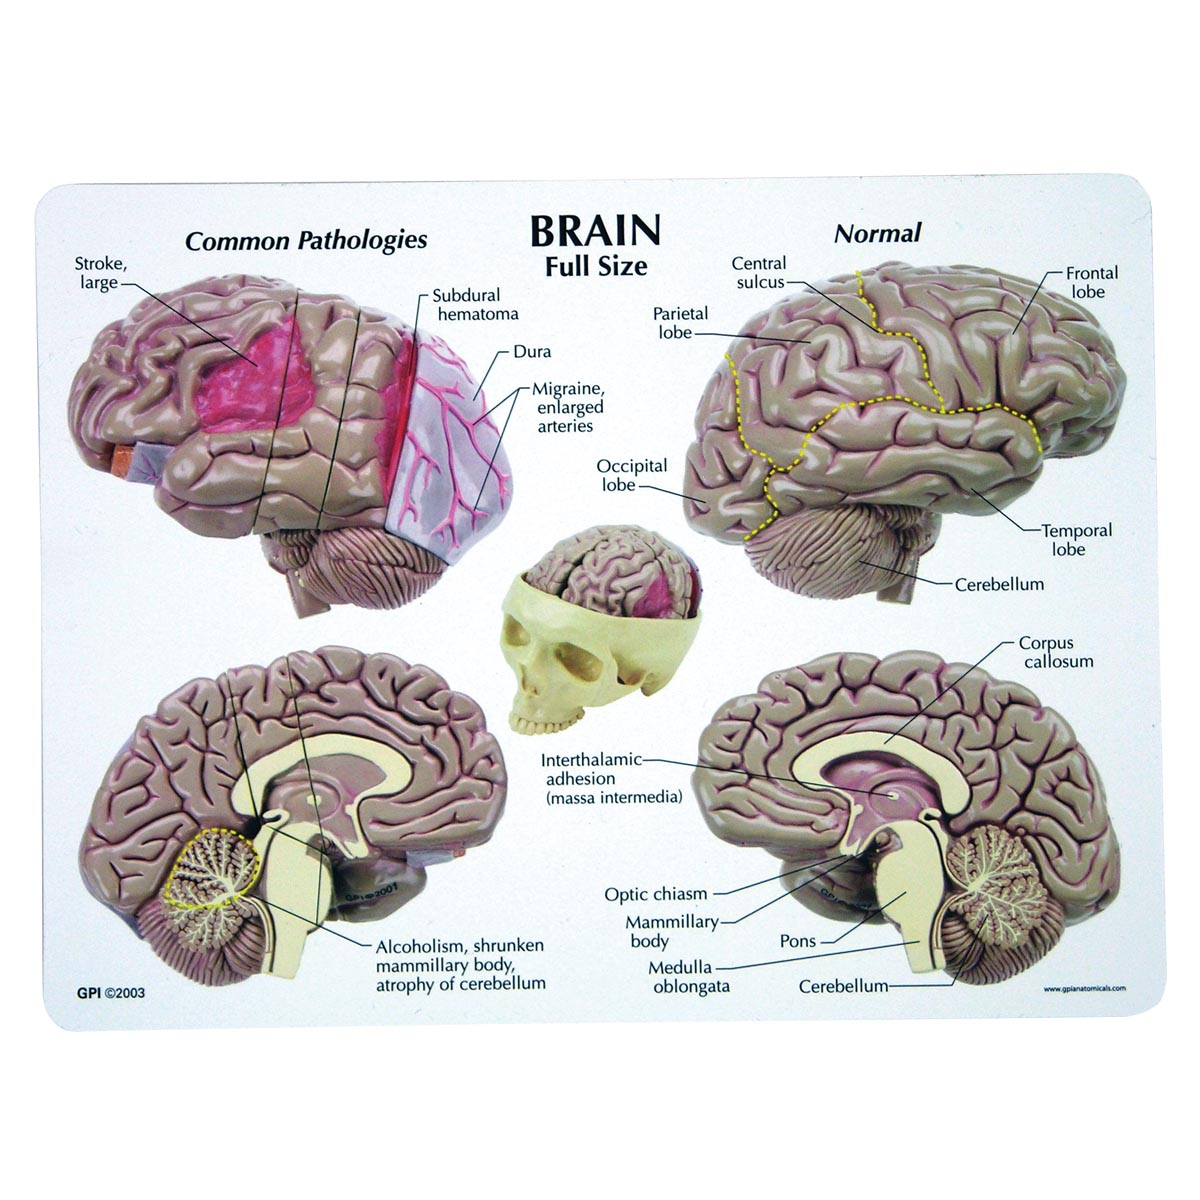 Brain Model - 1019542 - 2900 - Human Brain Models | Models of Human ...